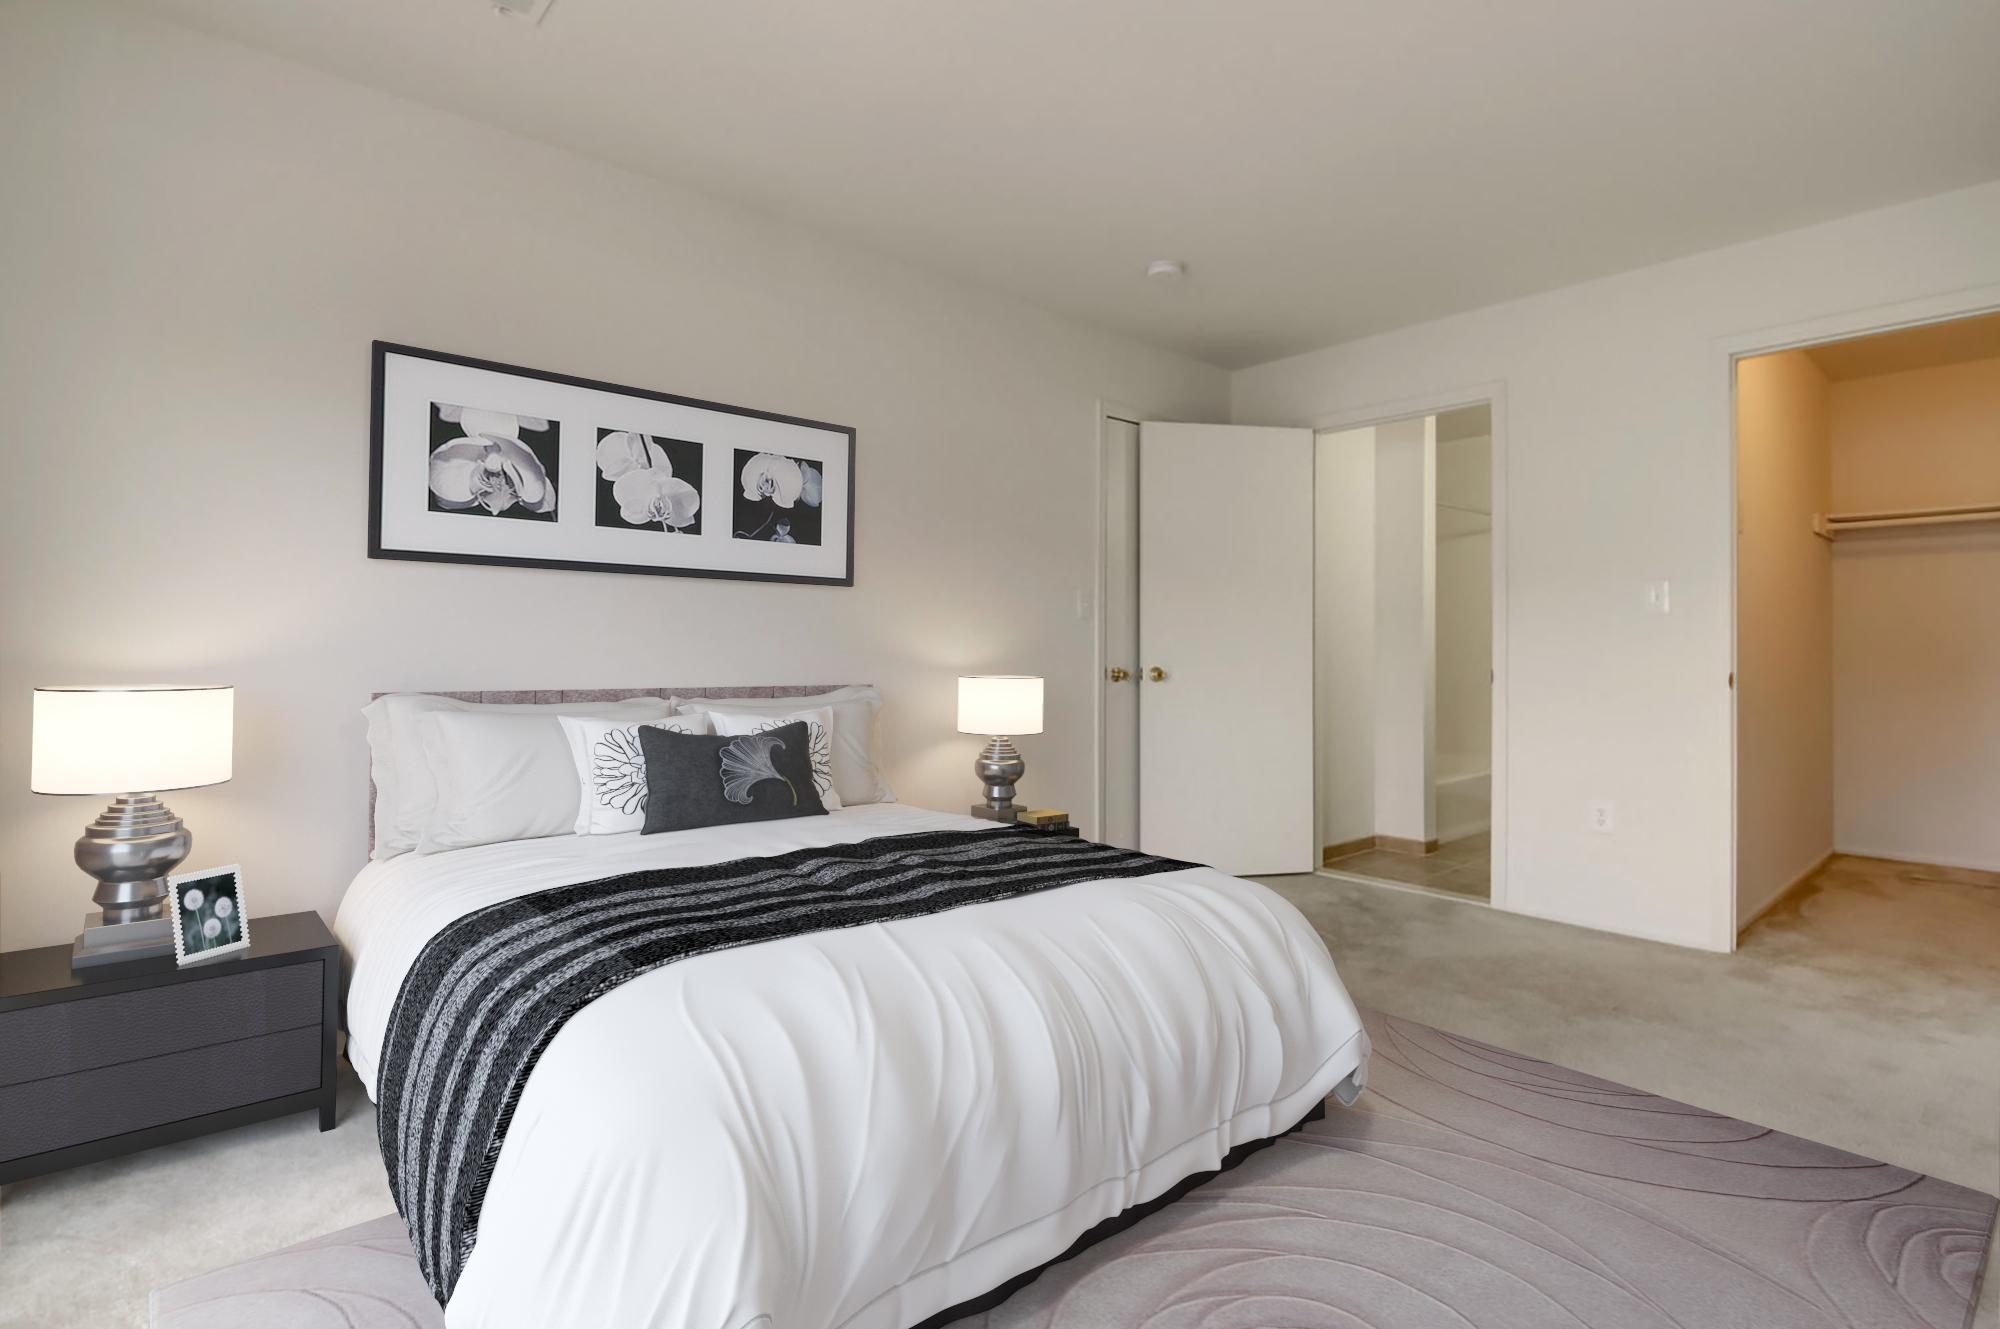 Woodbridge Apartment Rentals Woodbridge Nj Barron S Gate